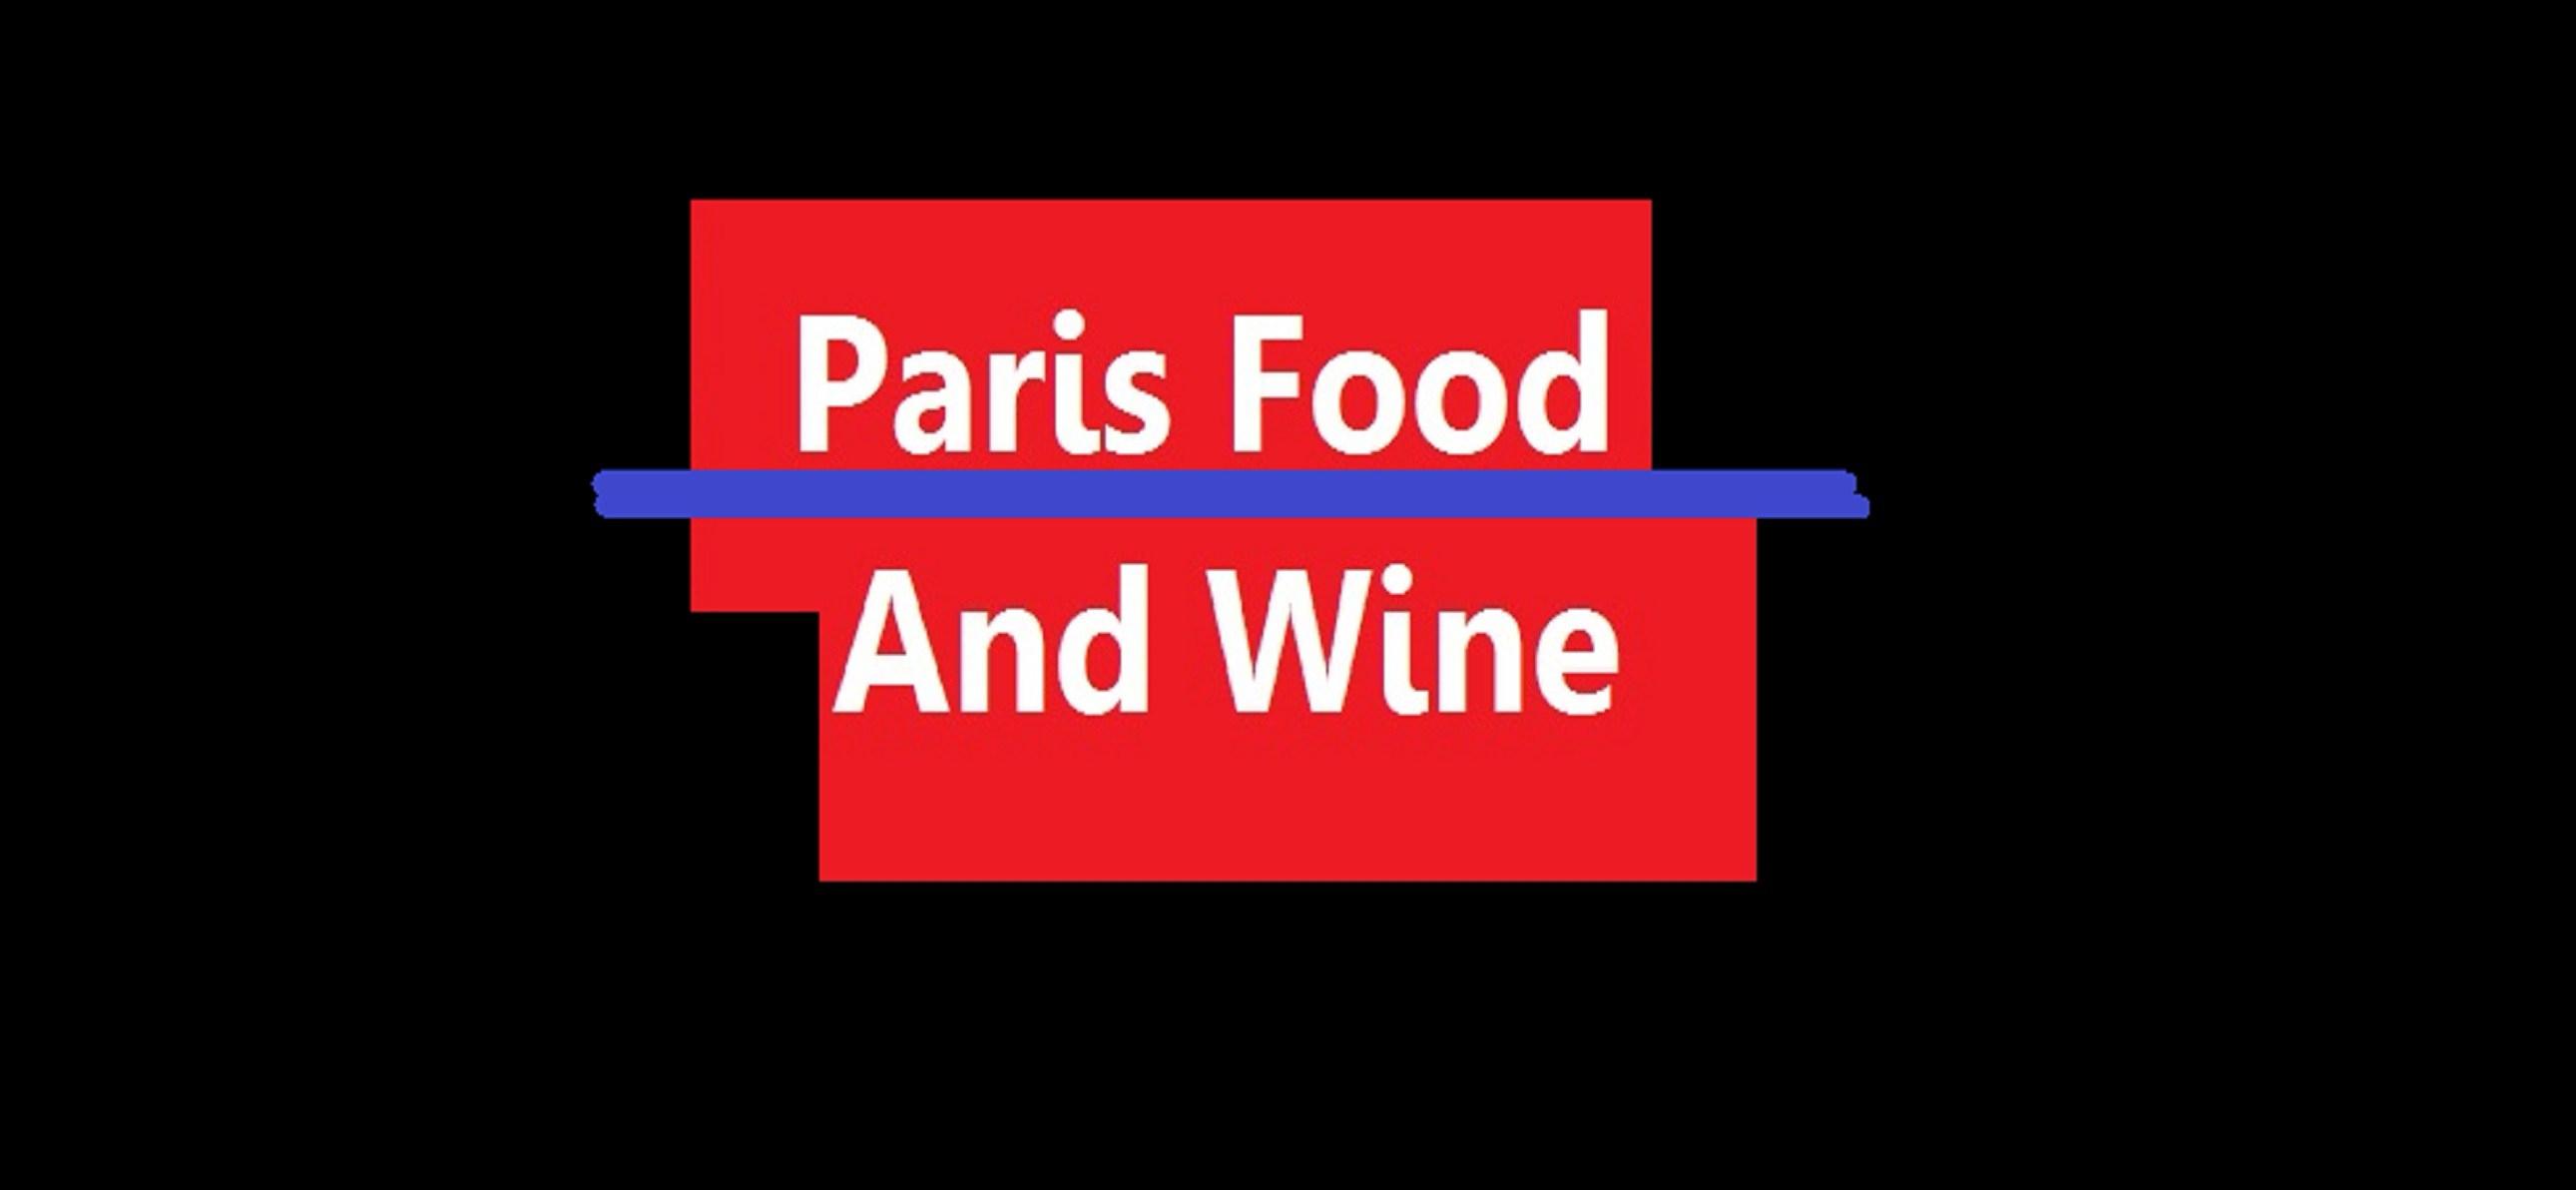 Paris Food And Wine logo